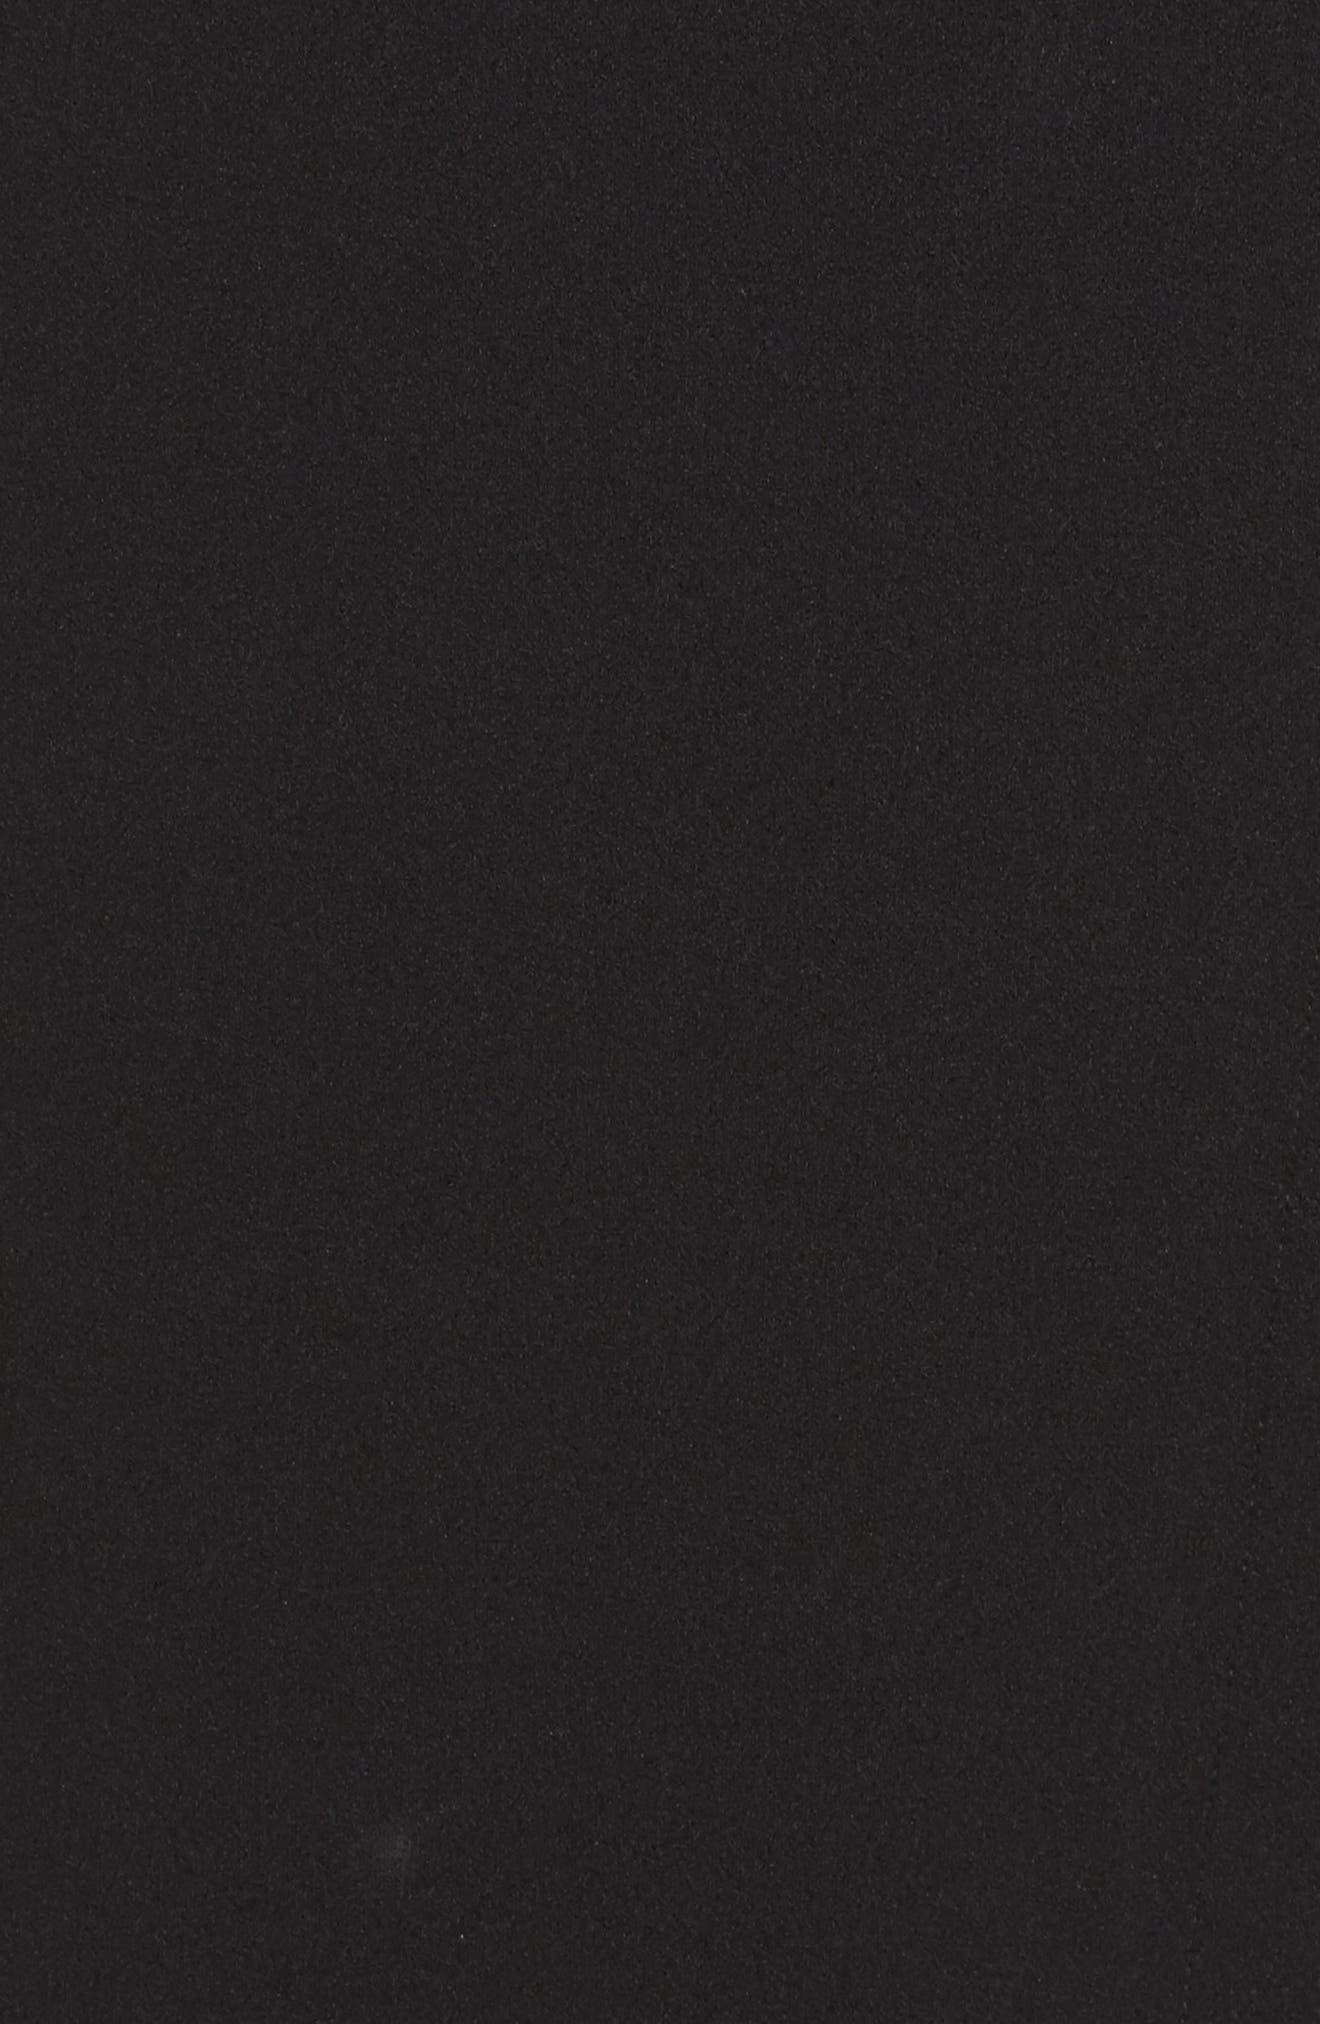 Crepe Sheath Dress,                             Alternate thumbnail 5, color,                             002